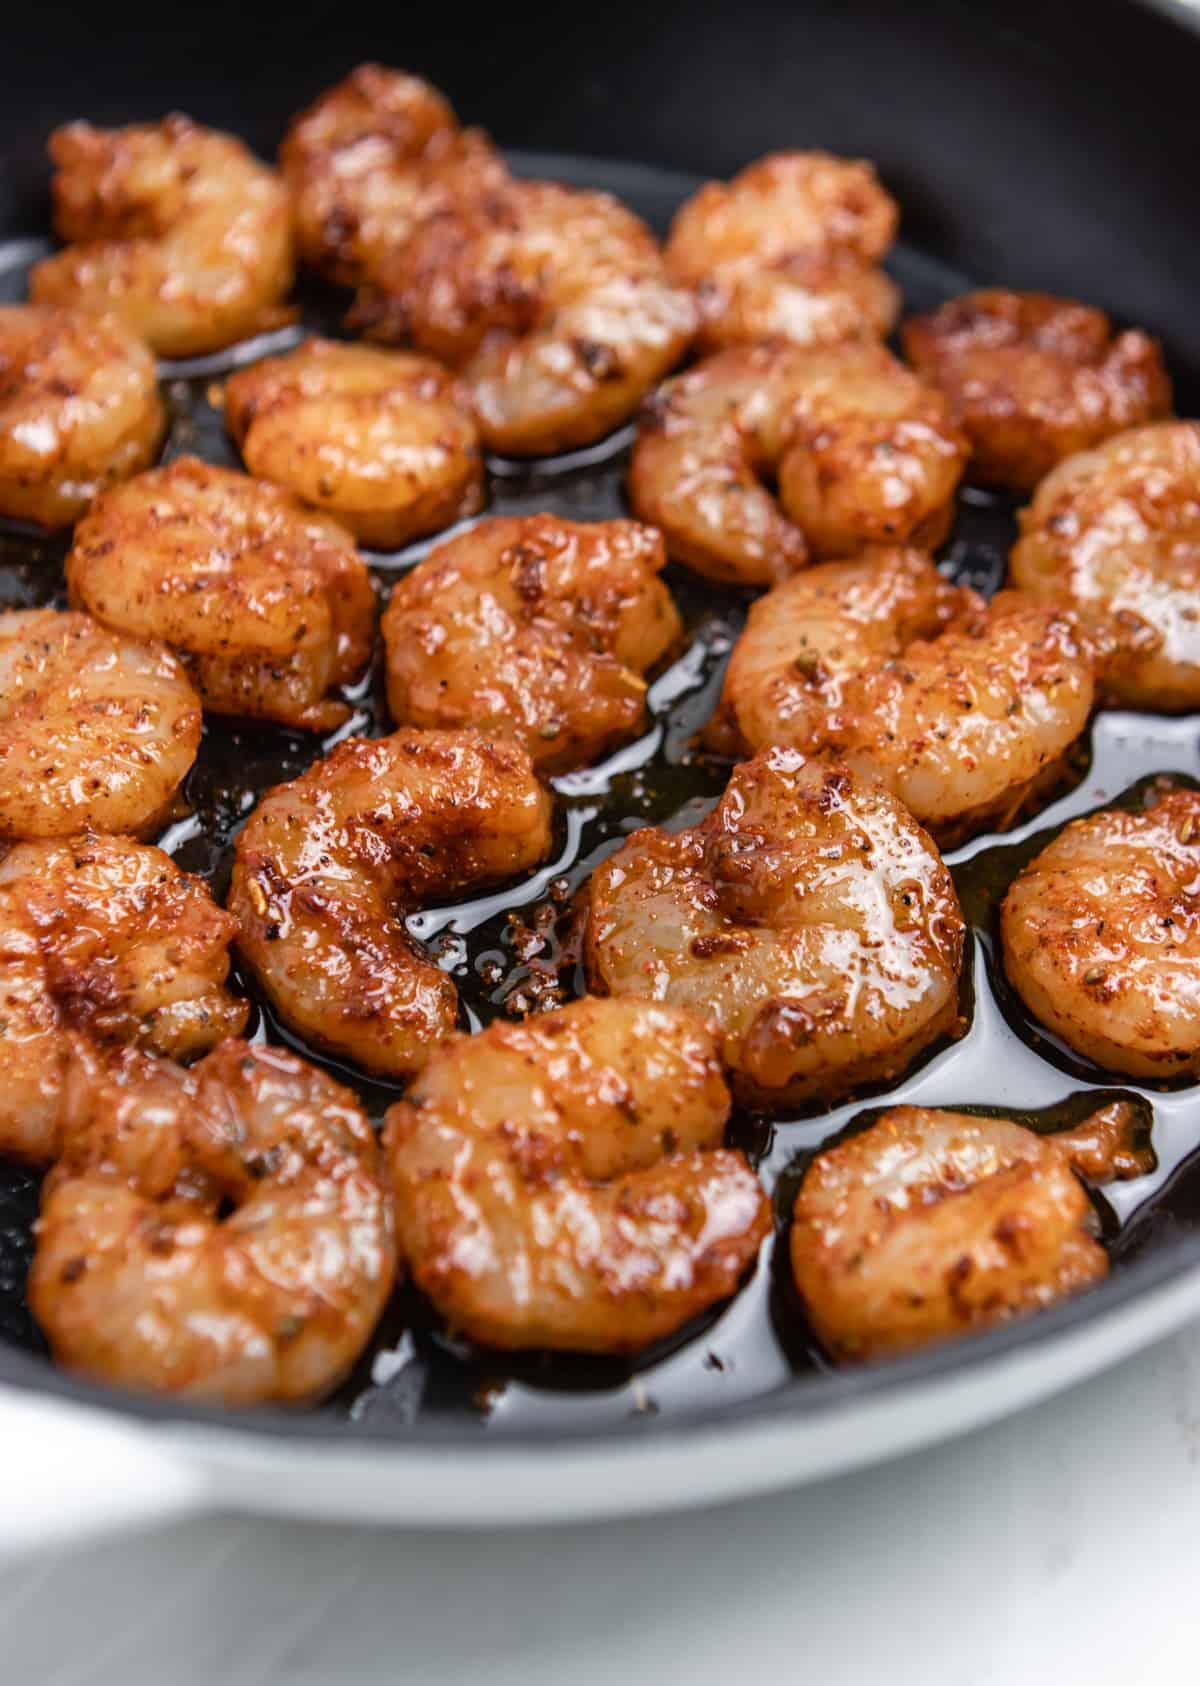 Spicy shrimp in skillet being pan fried.